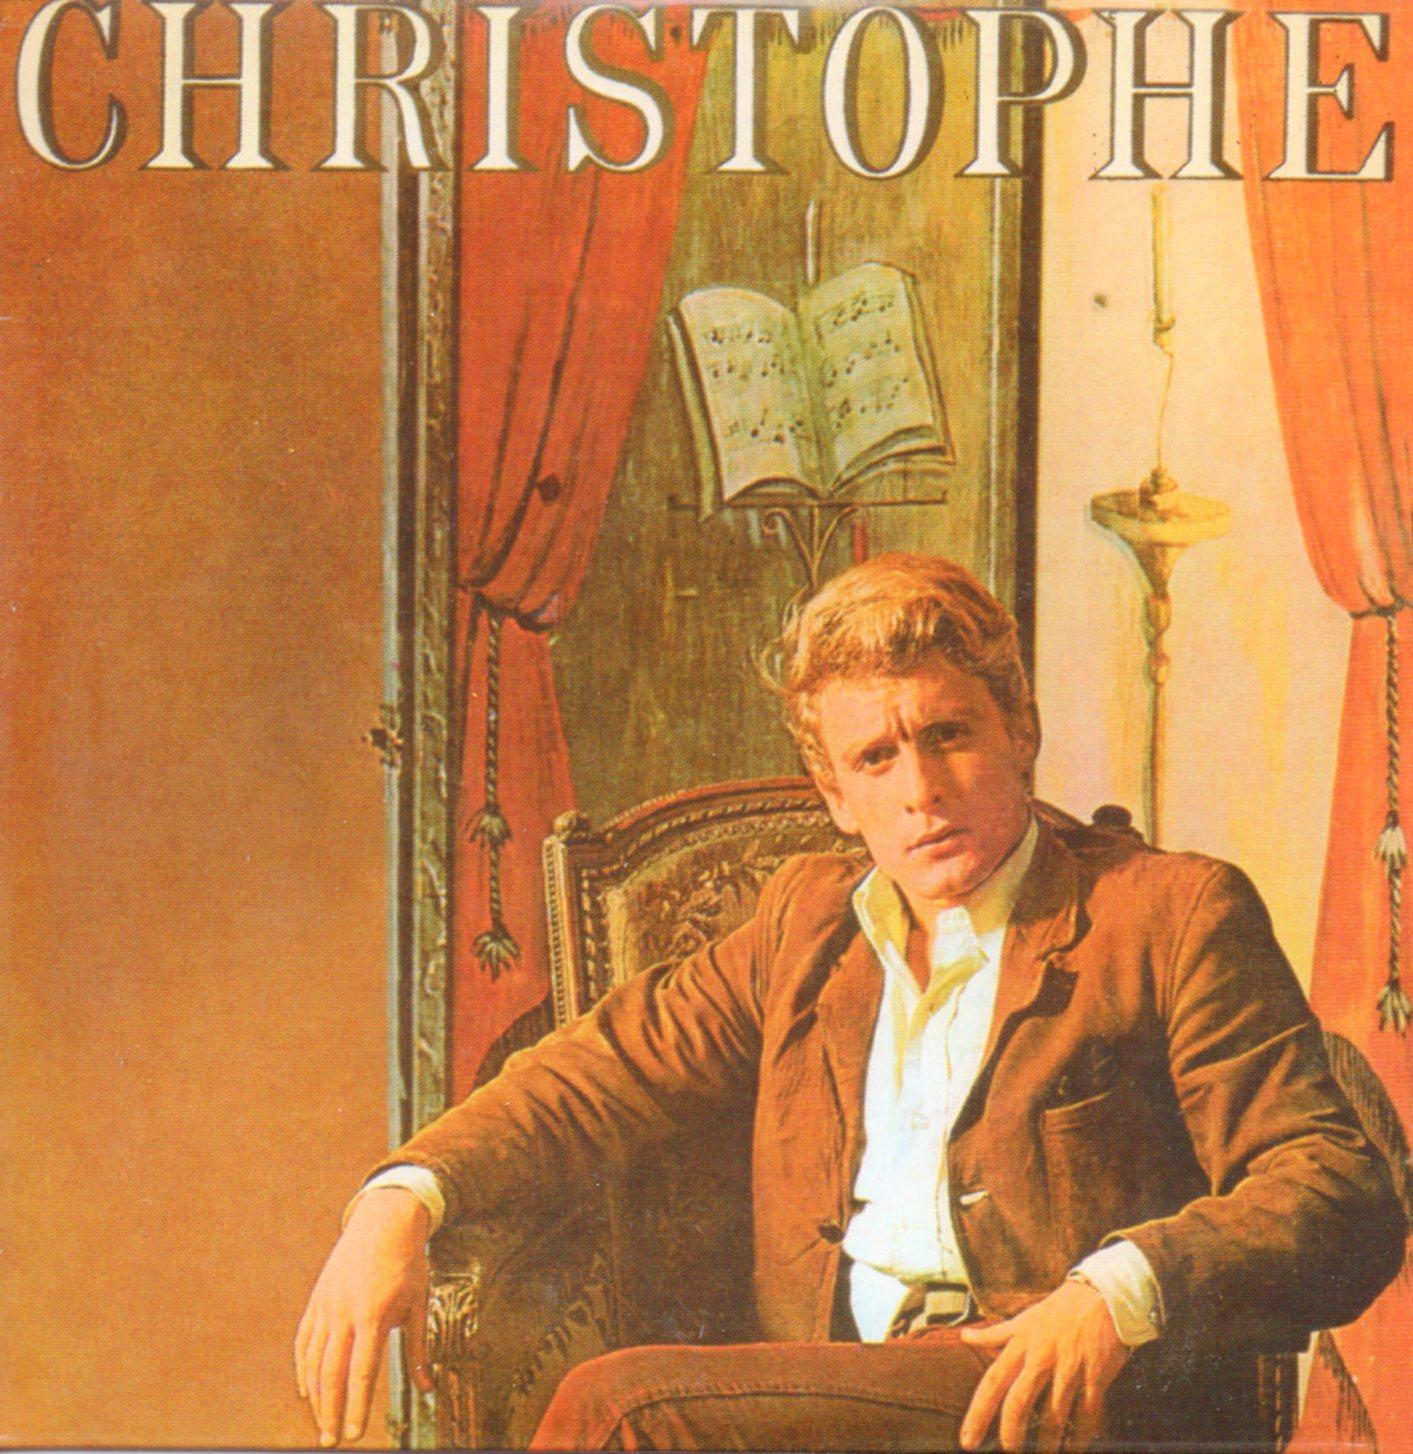 CHRISTOPHE - Aline - Mini LP Replica CARD SLEEVE - 11-TRACK - CD